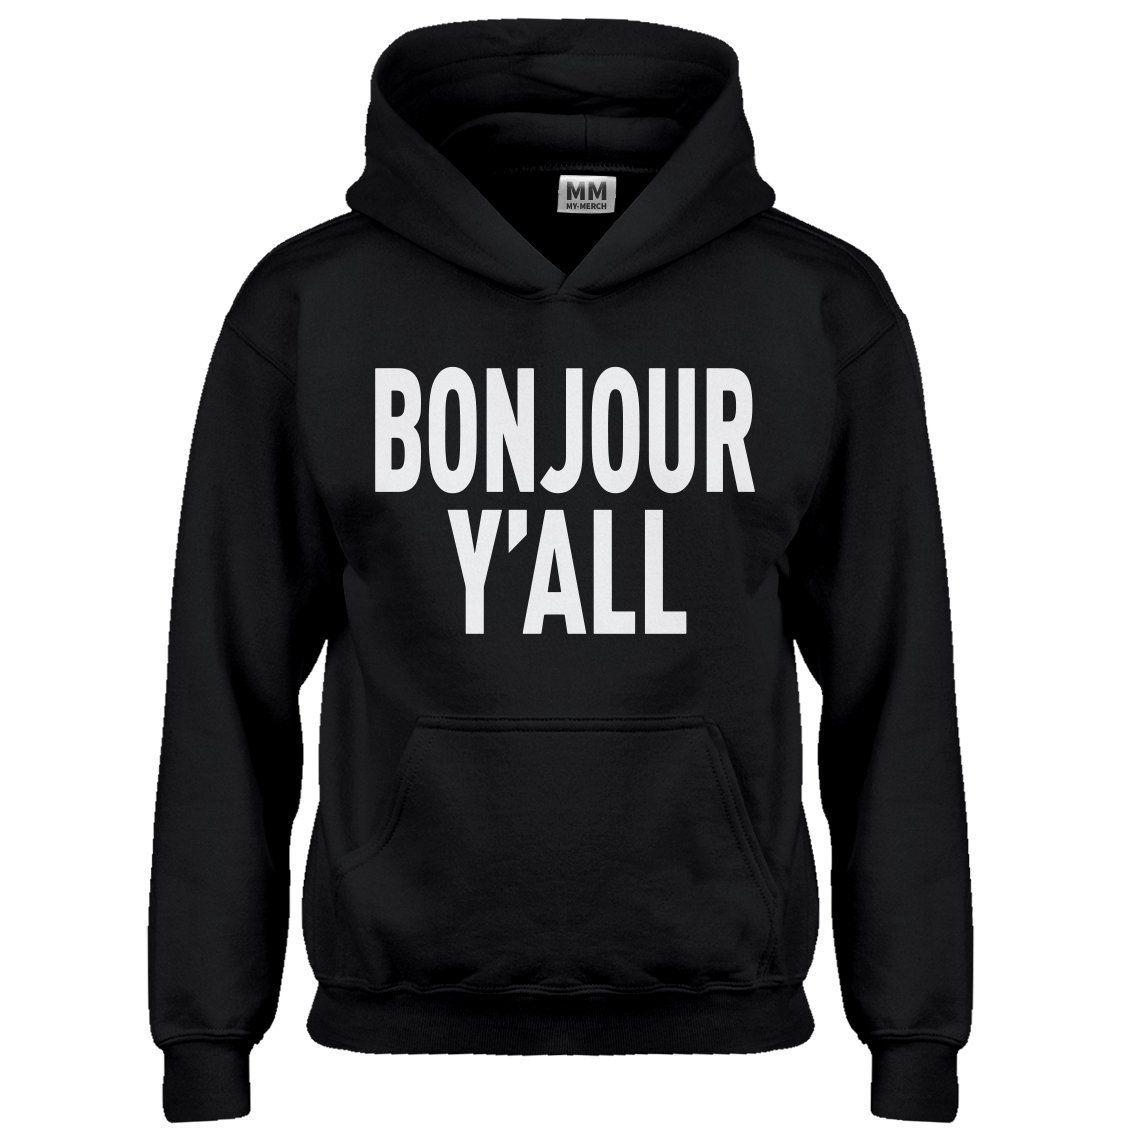 Hoodie Bonjour Yall Kids Hoodie Hoodies Shirts School Shirts